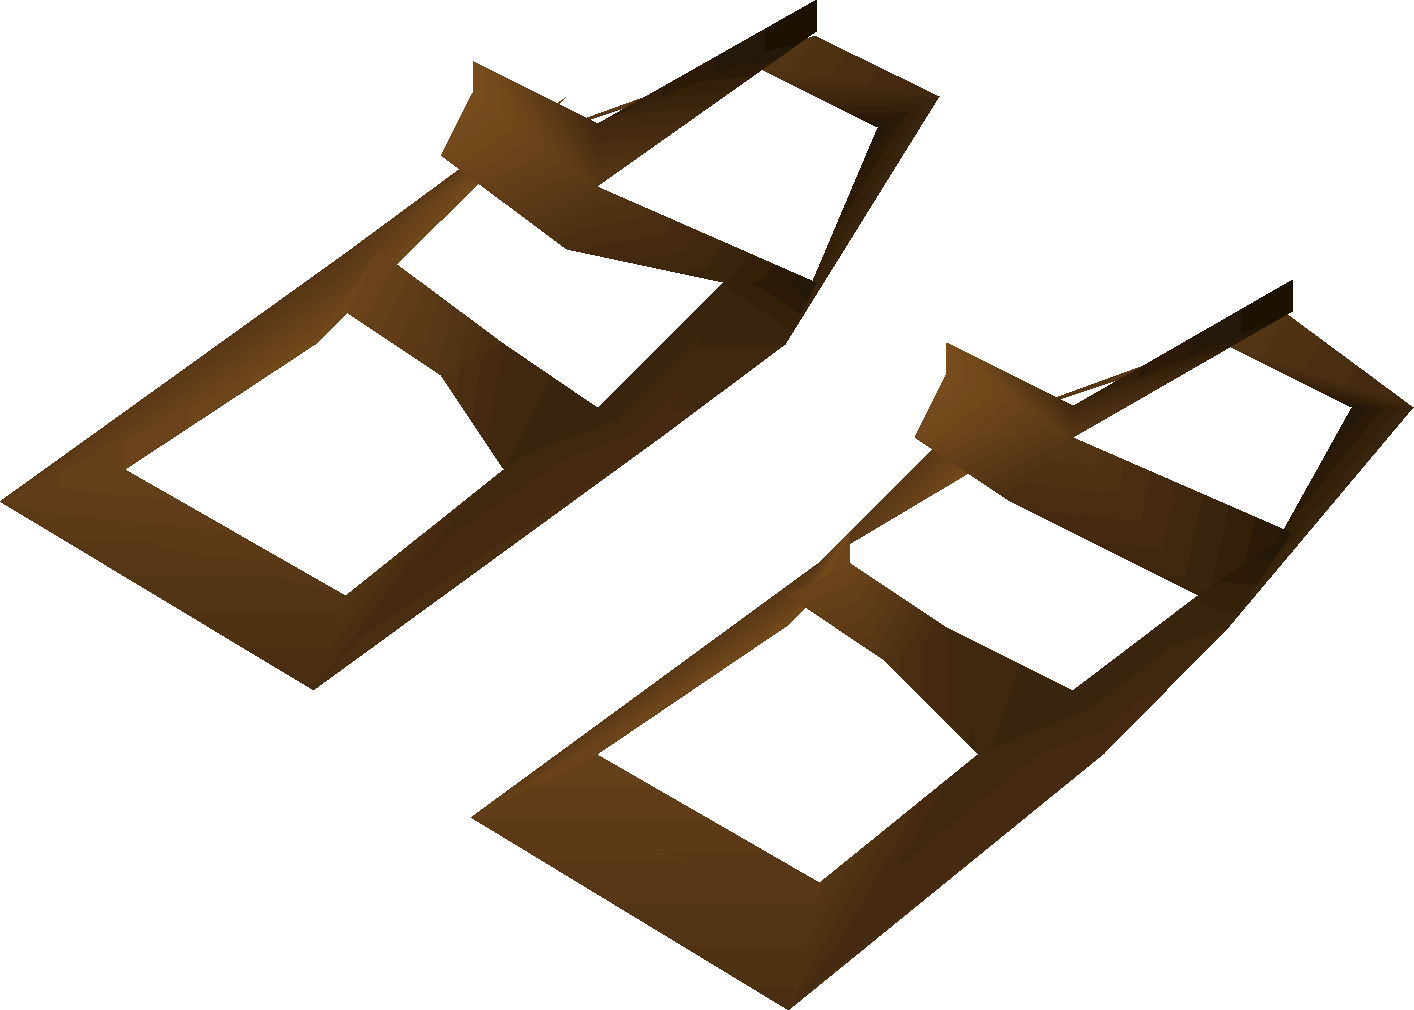 54044afaca55e4 Villager sandals (brown) - OSRS Wiki